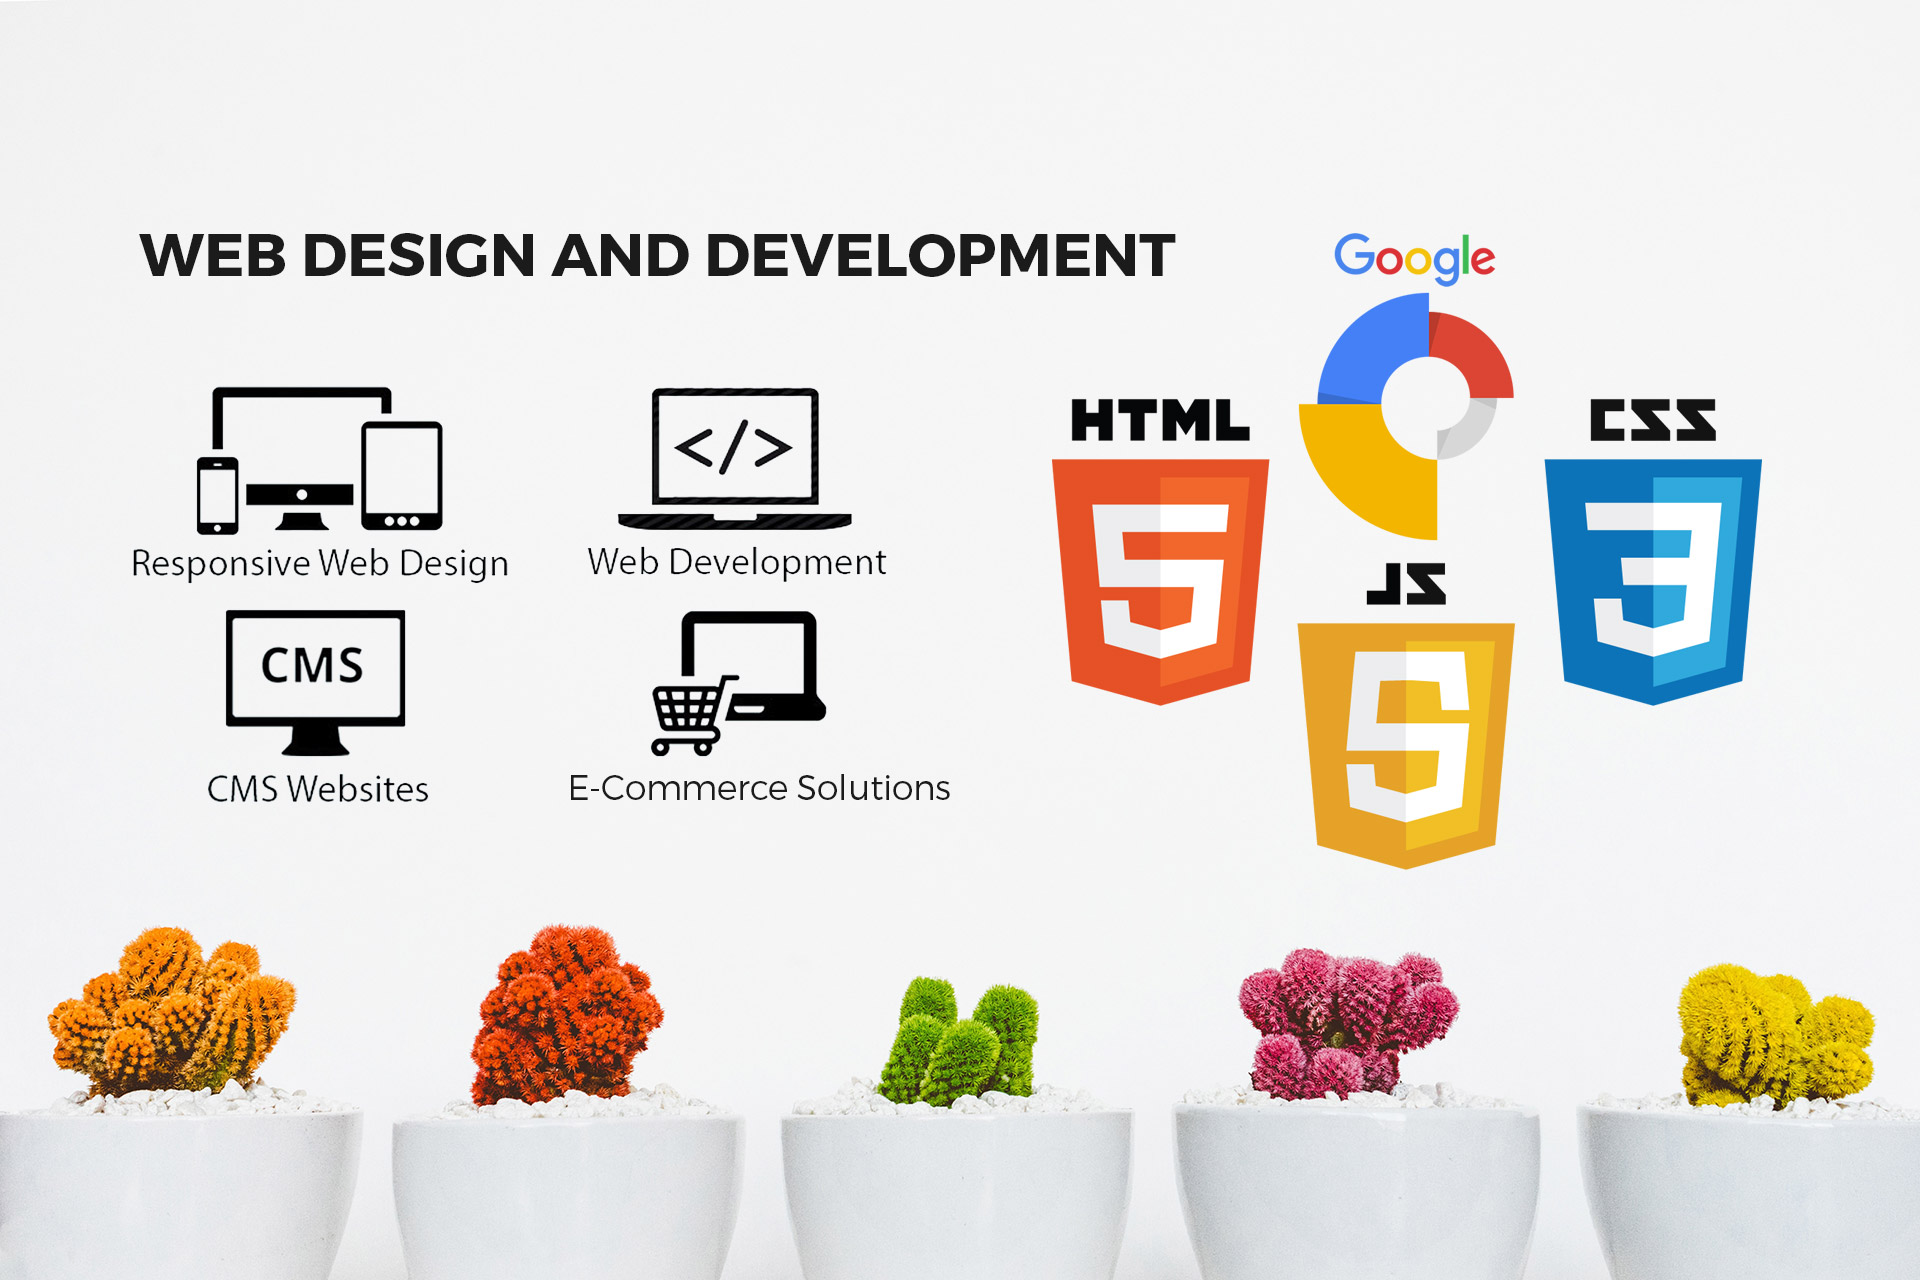 kunst connected - web design and development